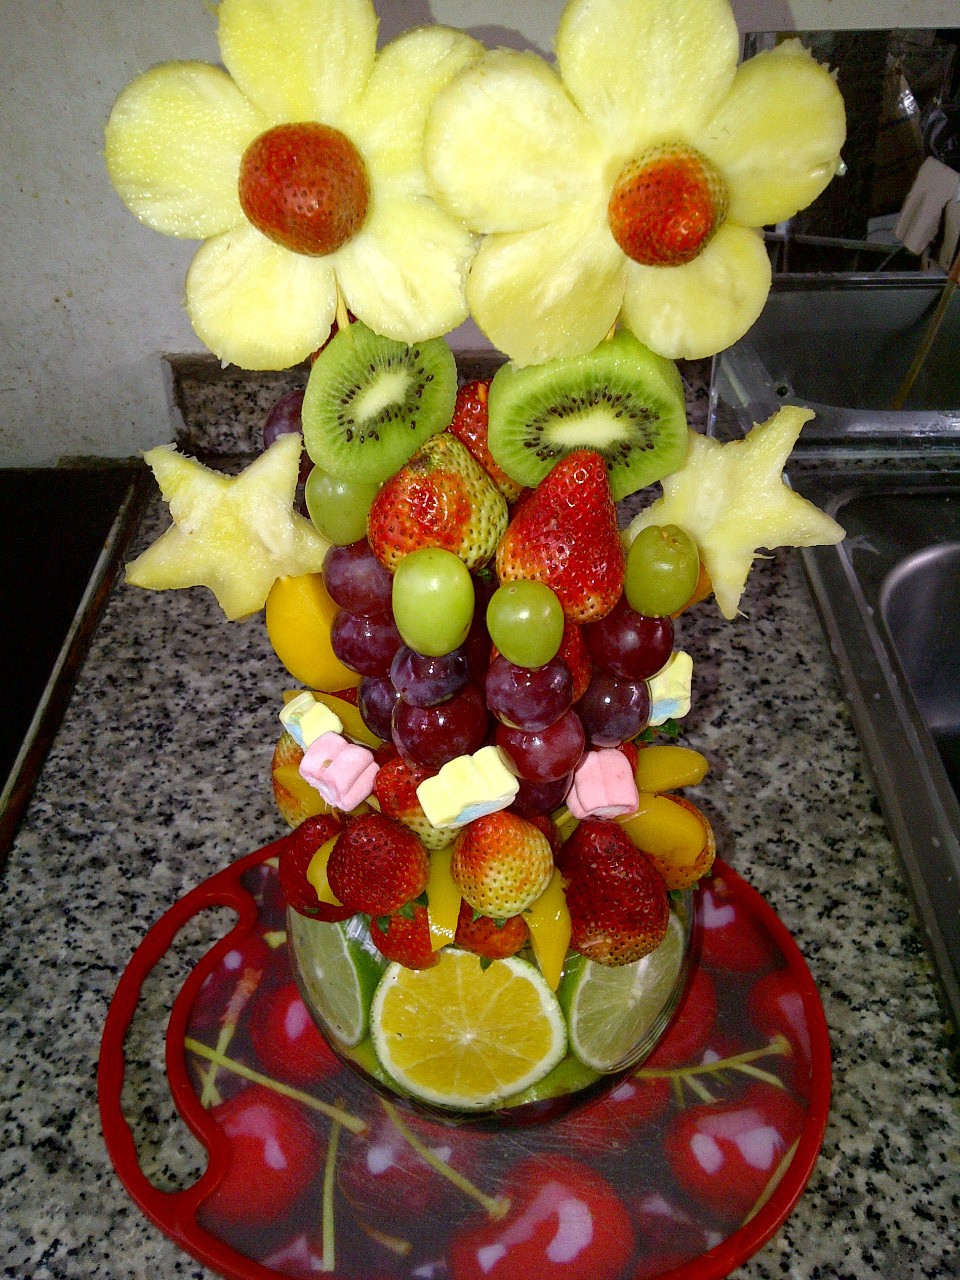 Arreglos de frutas para bautizo imagui for Centros de frutas